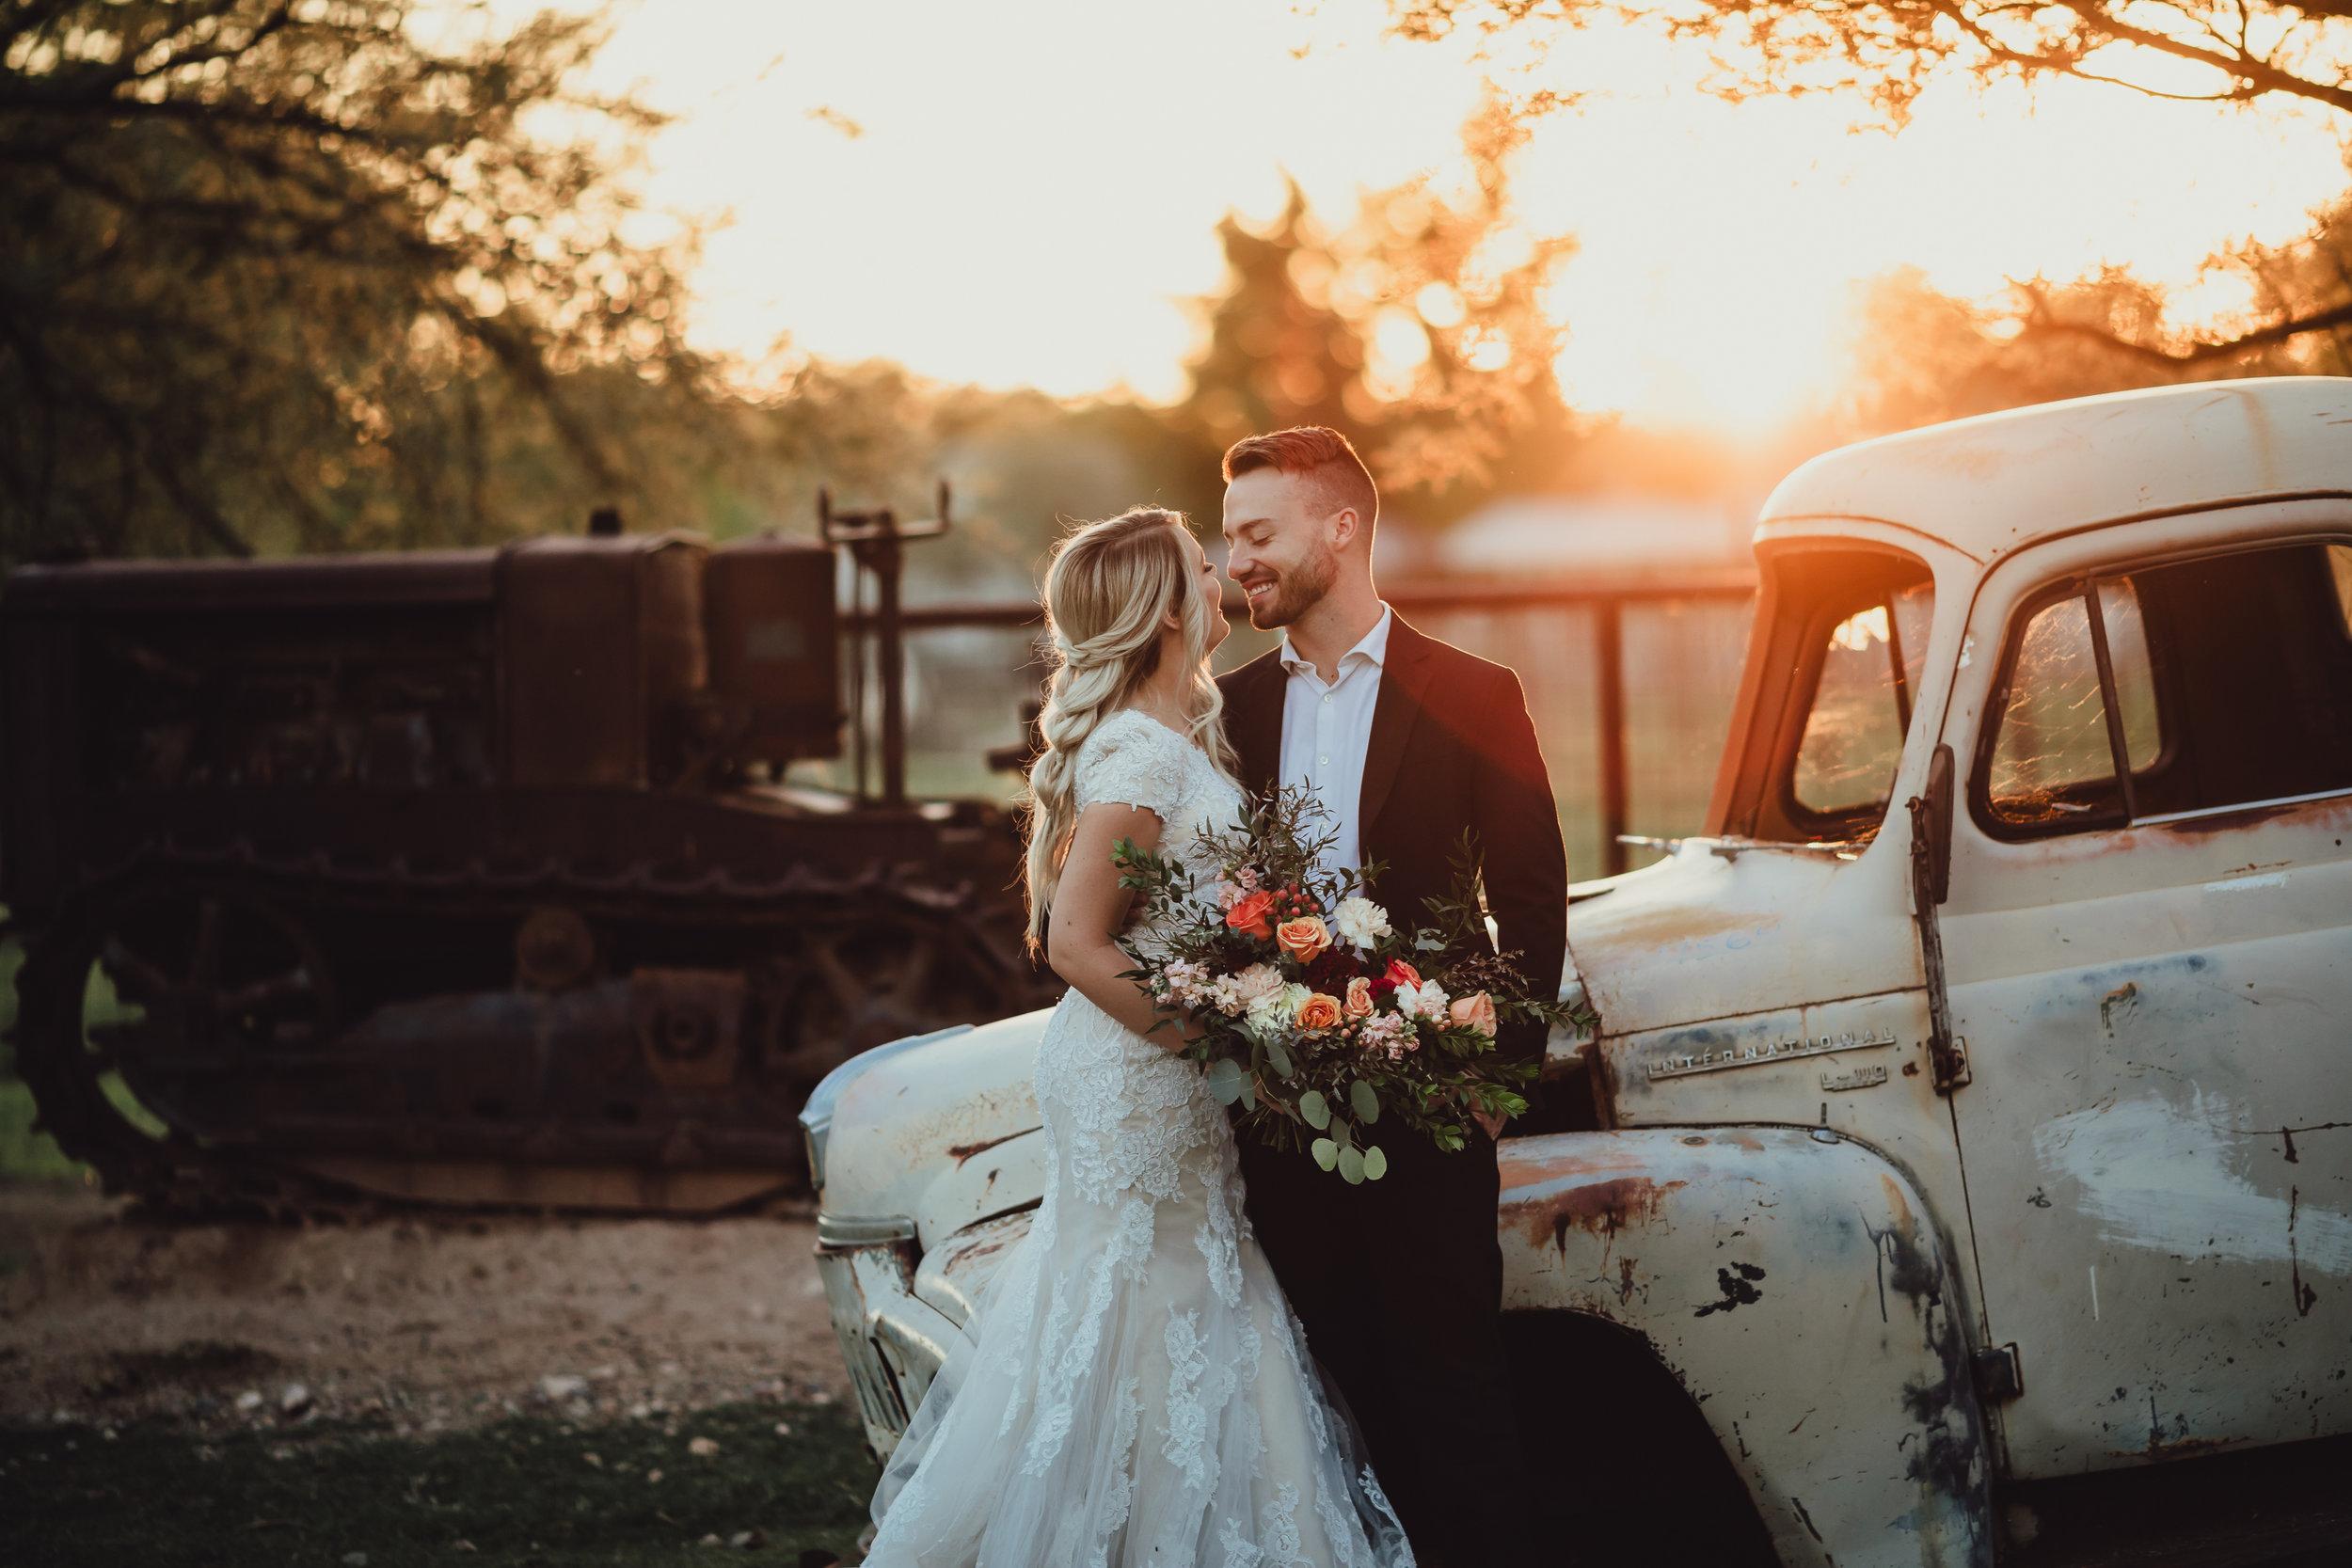 mintysnaps_farmwedding (8 of 20).jpg